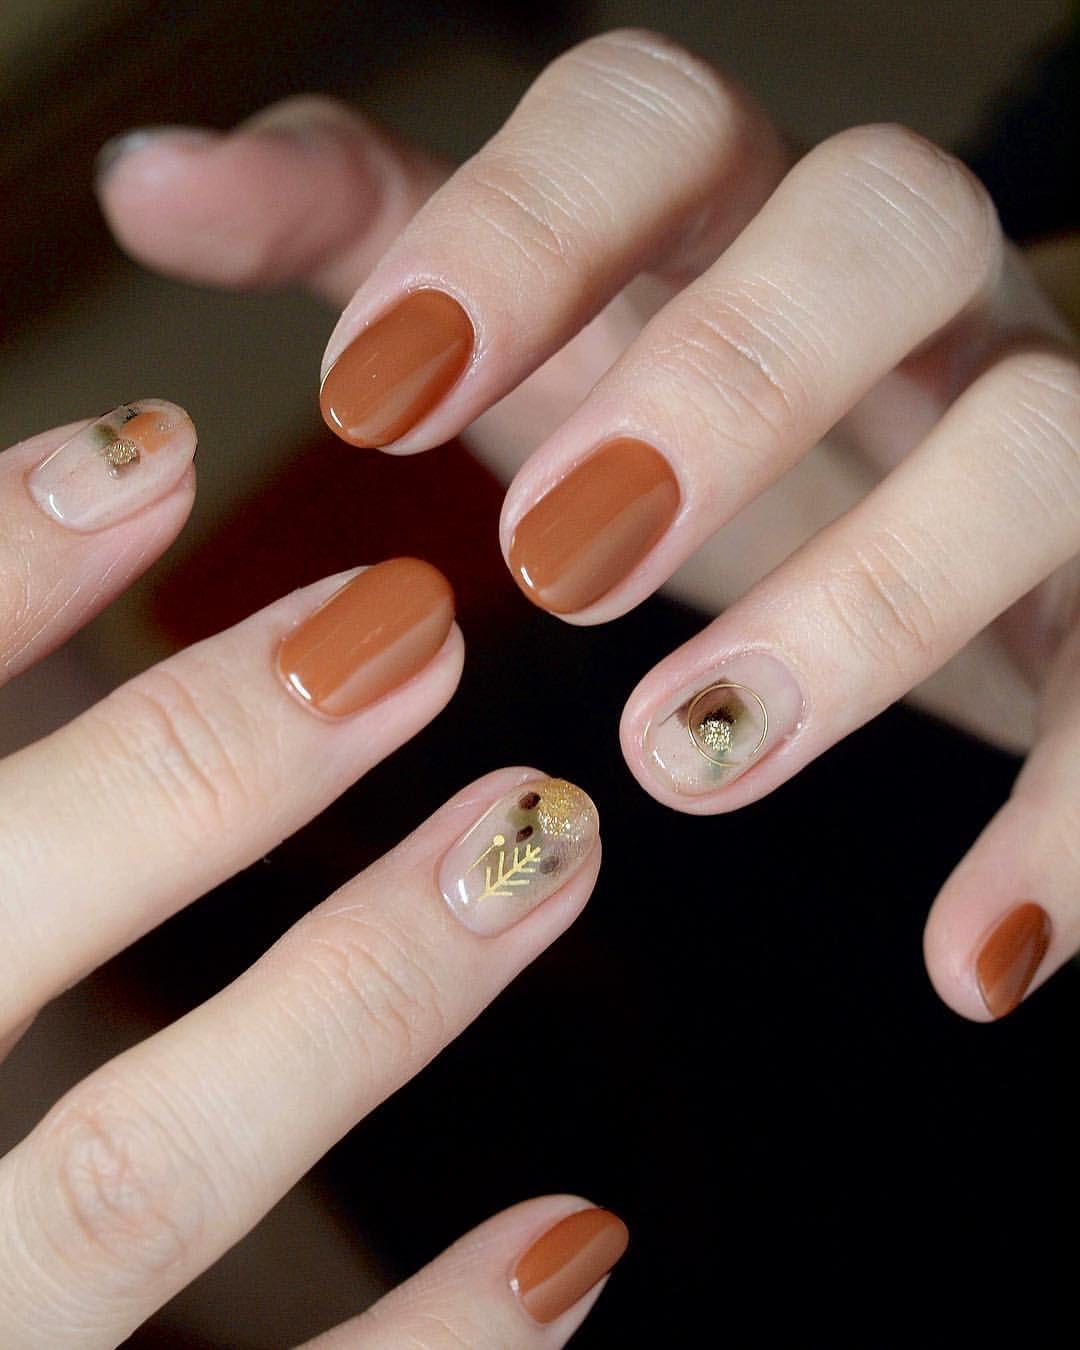 Nails」おしゃれまとめの人気アイデア|Pinterest |Nerve【2019